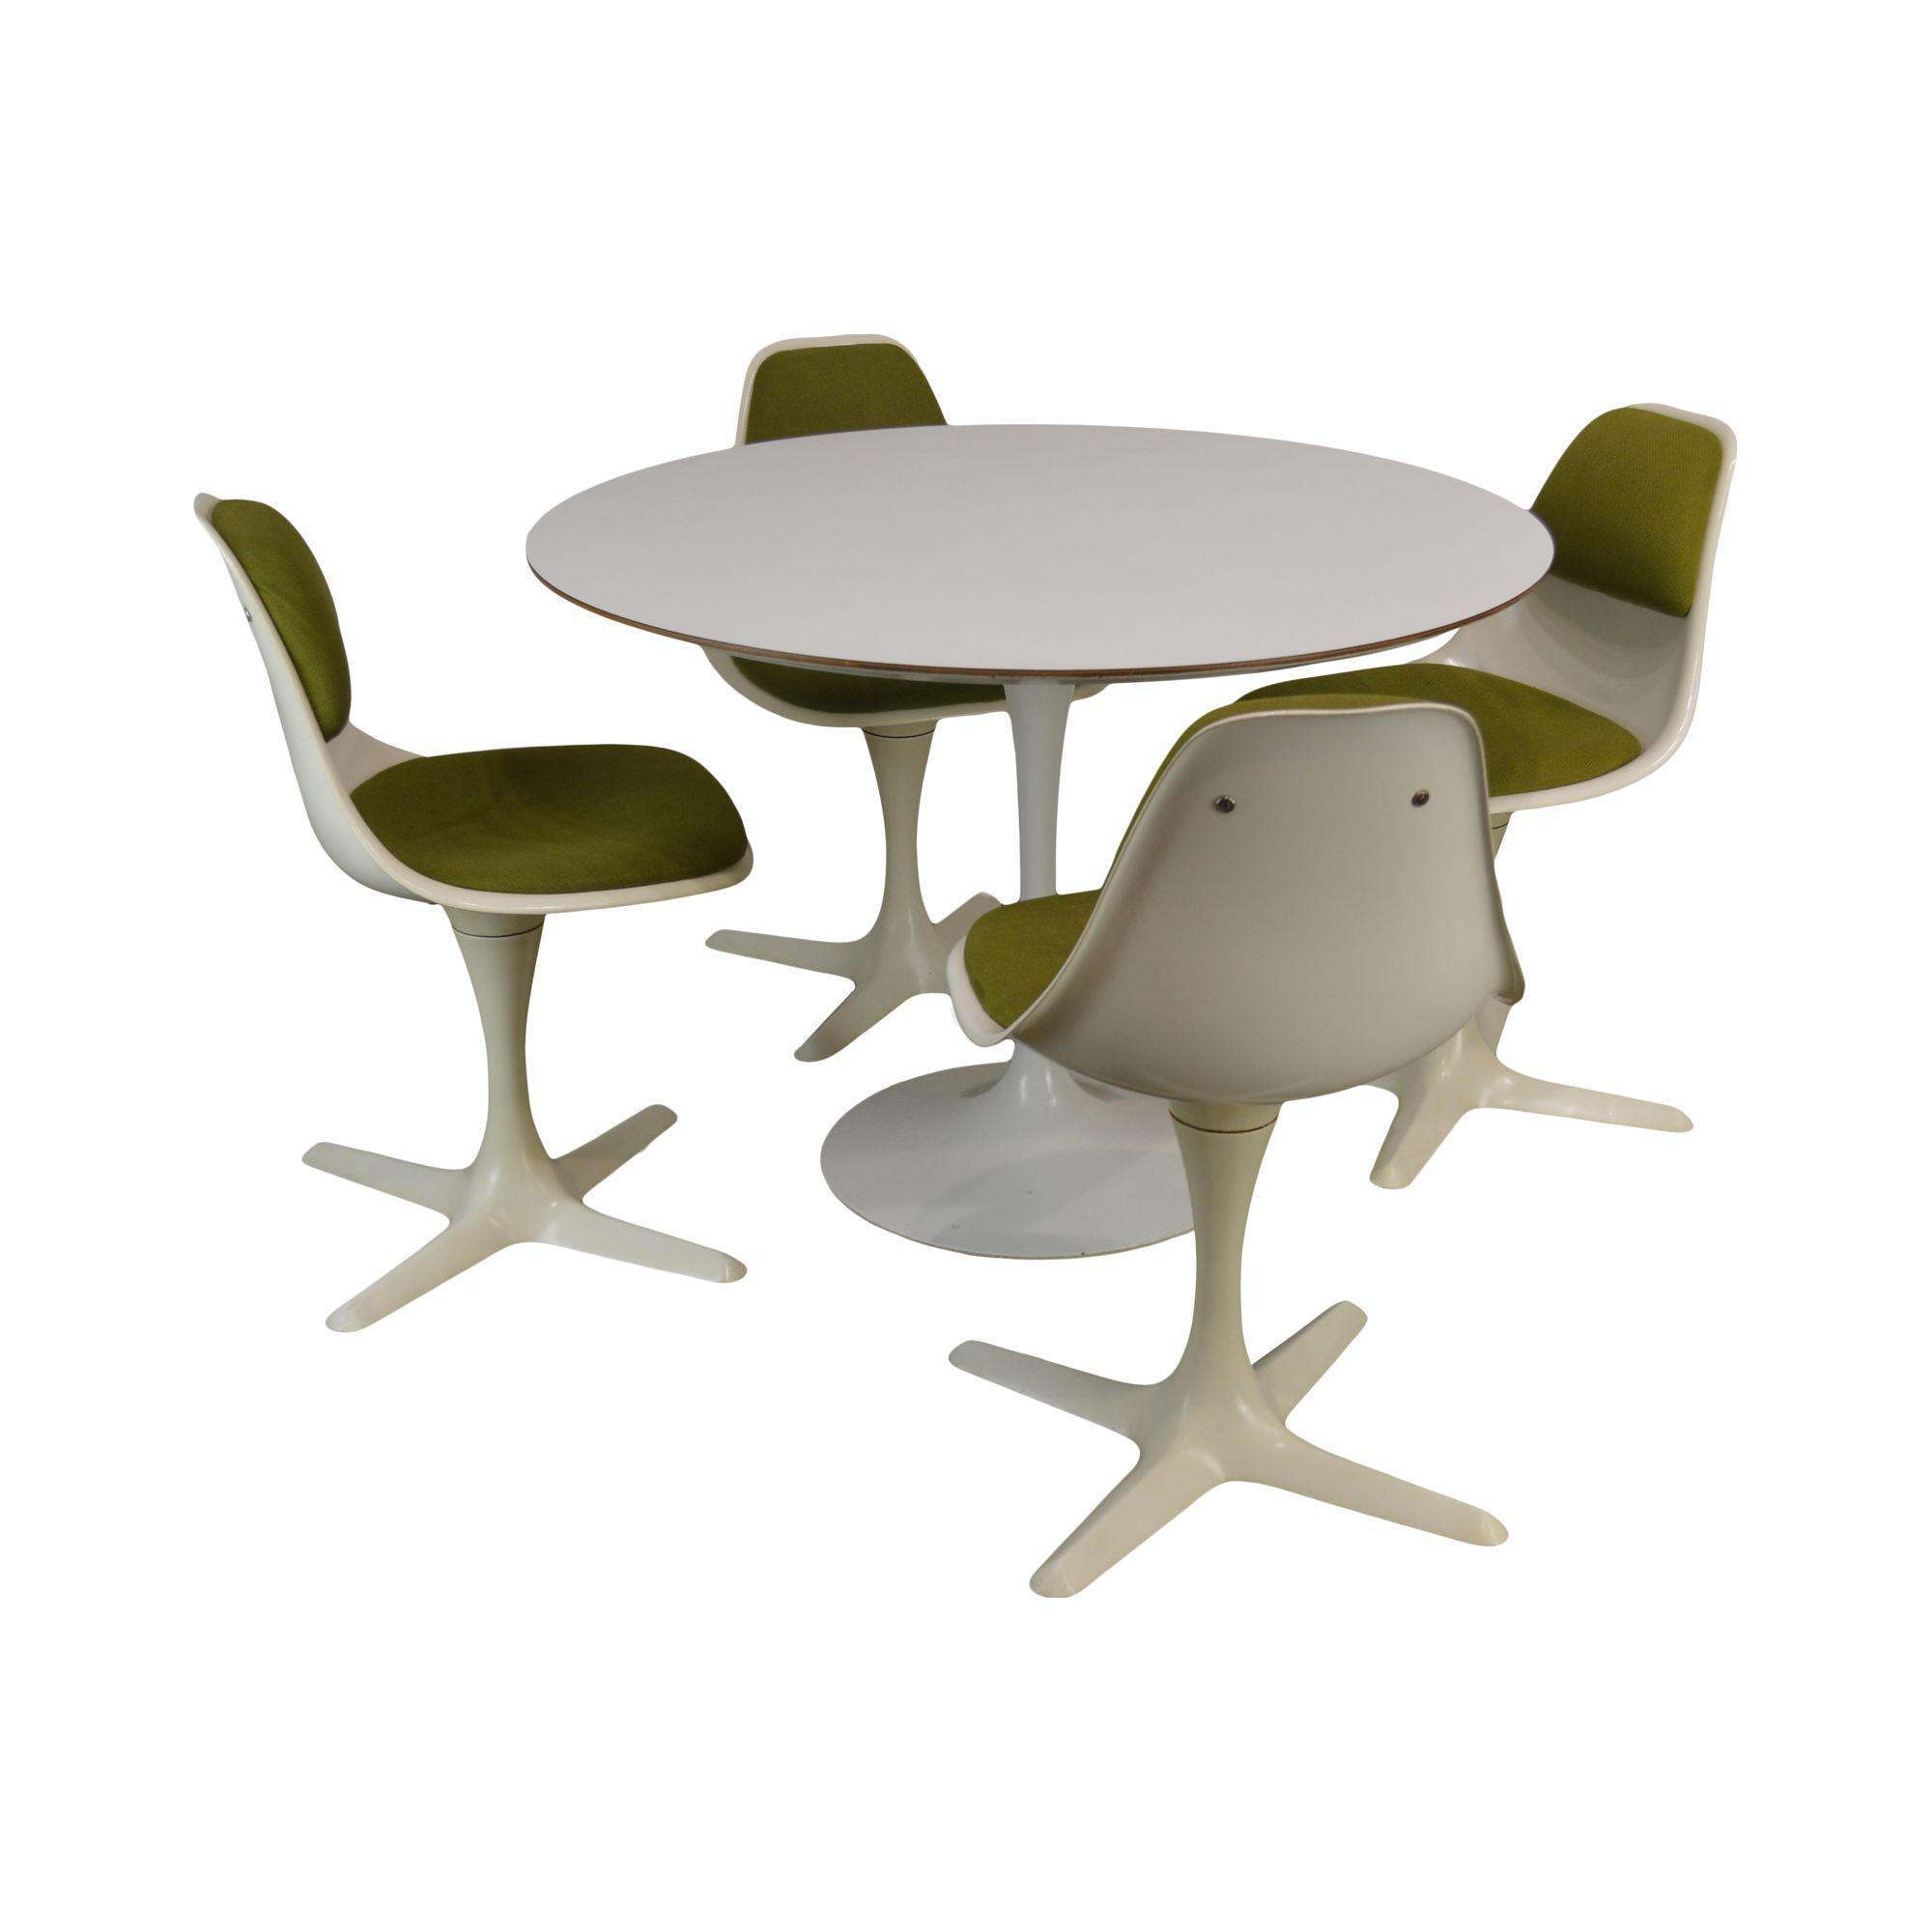 Cool Burke Inc Mid Century Modern Saarinen Style Tulip Round Table 4 Chairs Dining Set Unemploymentrelief Wooden Chair Designs For Living Room Unemploymentrelieforg